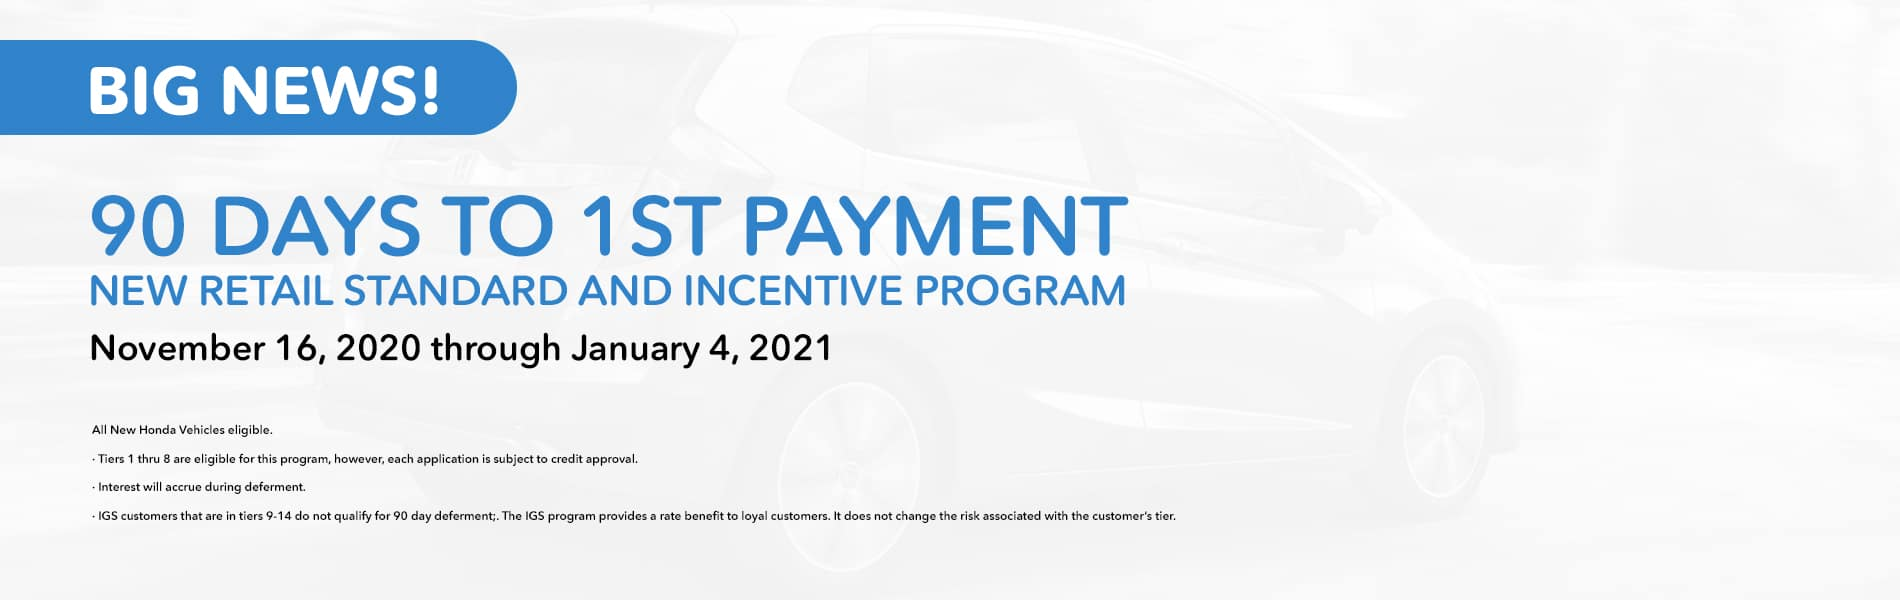 BIG NEWS! Honda - 90 Days to 1st Payment